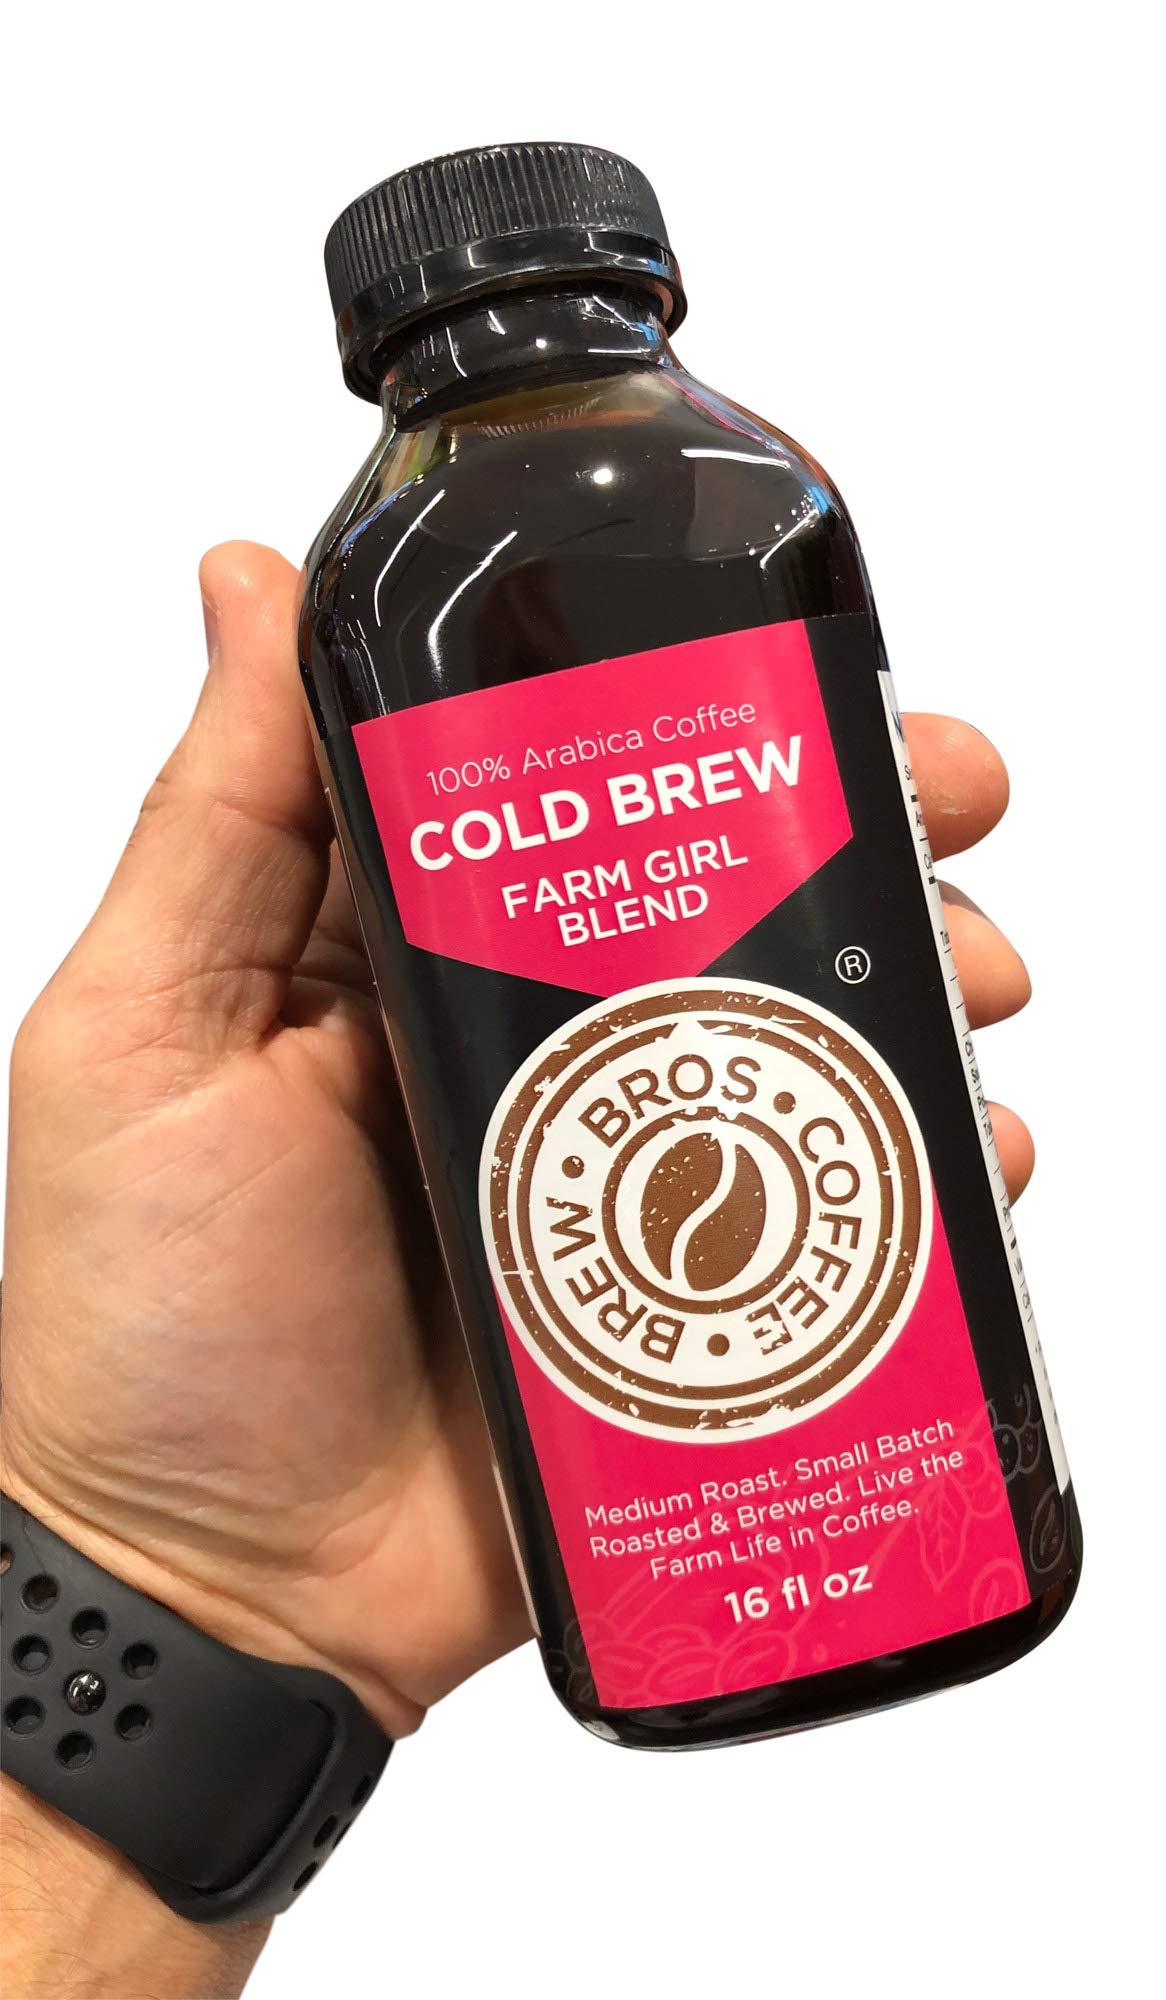 Artisan Small Batch Roasted 16 hour Brew Farm Girl COLD Brew Bros Coffee 8 pack - 16oz Smooth Medium Roast with Caffeine Kick